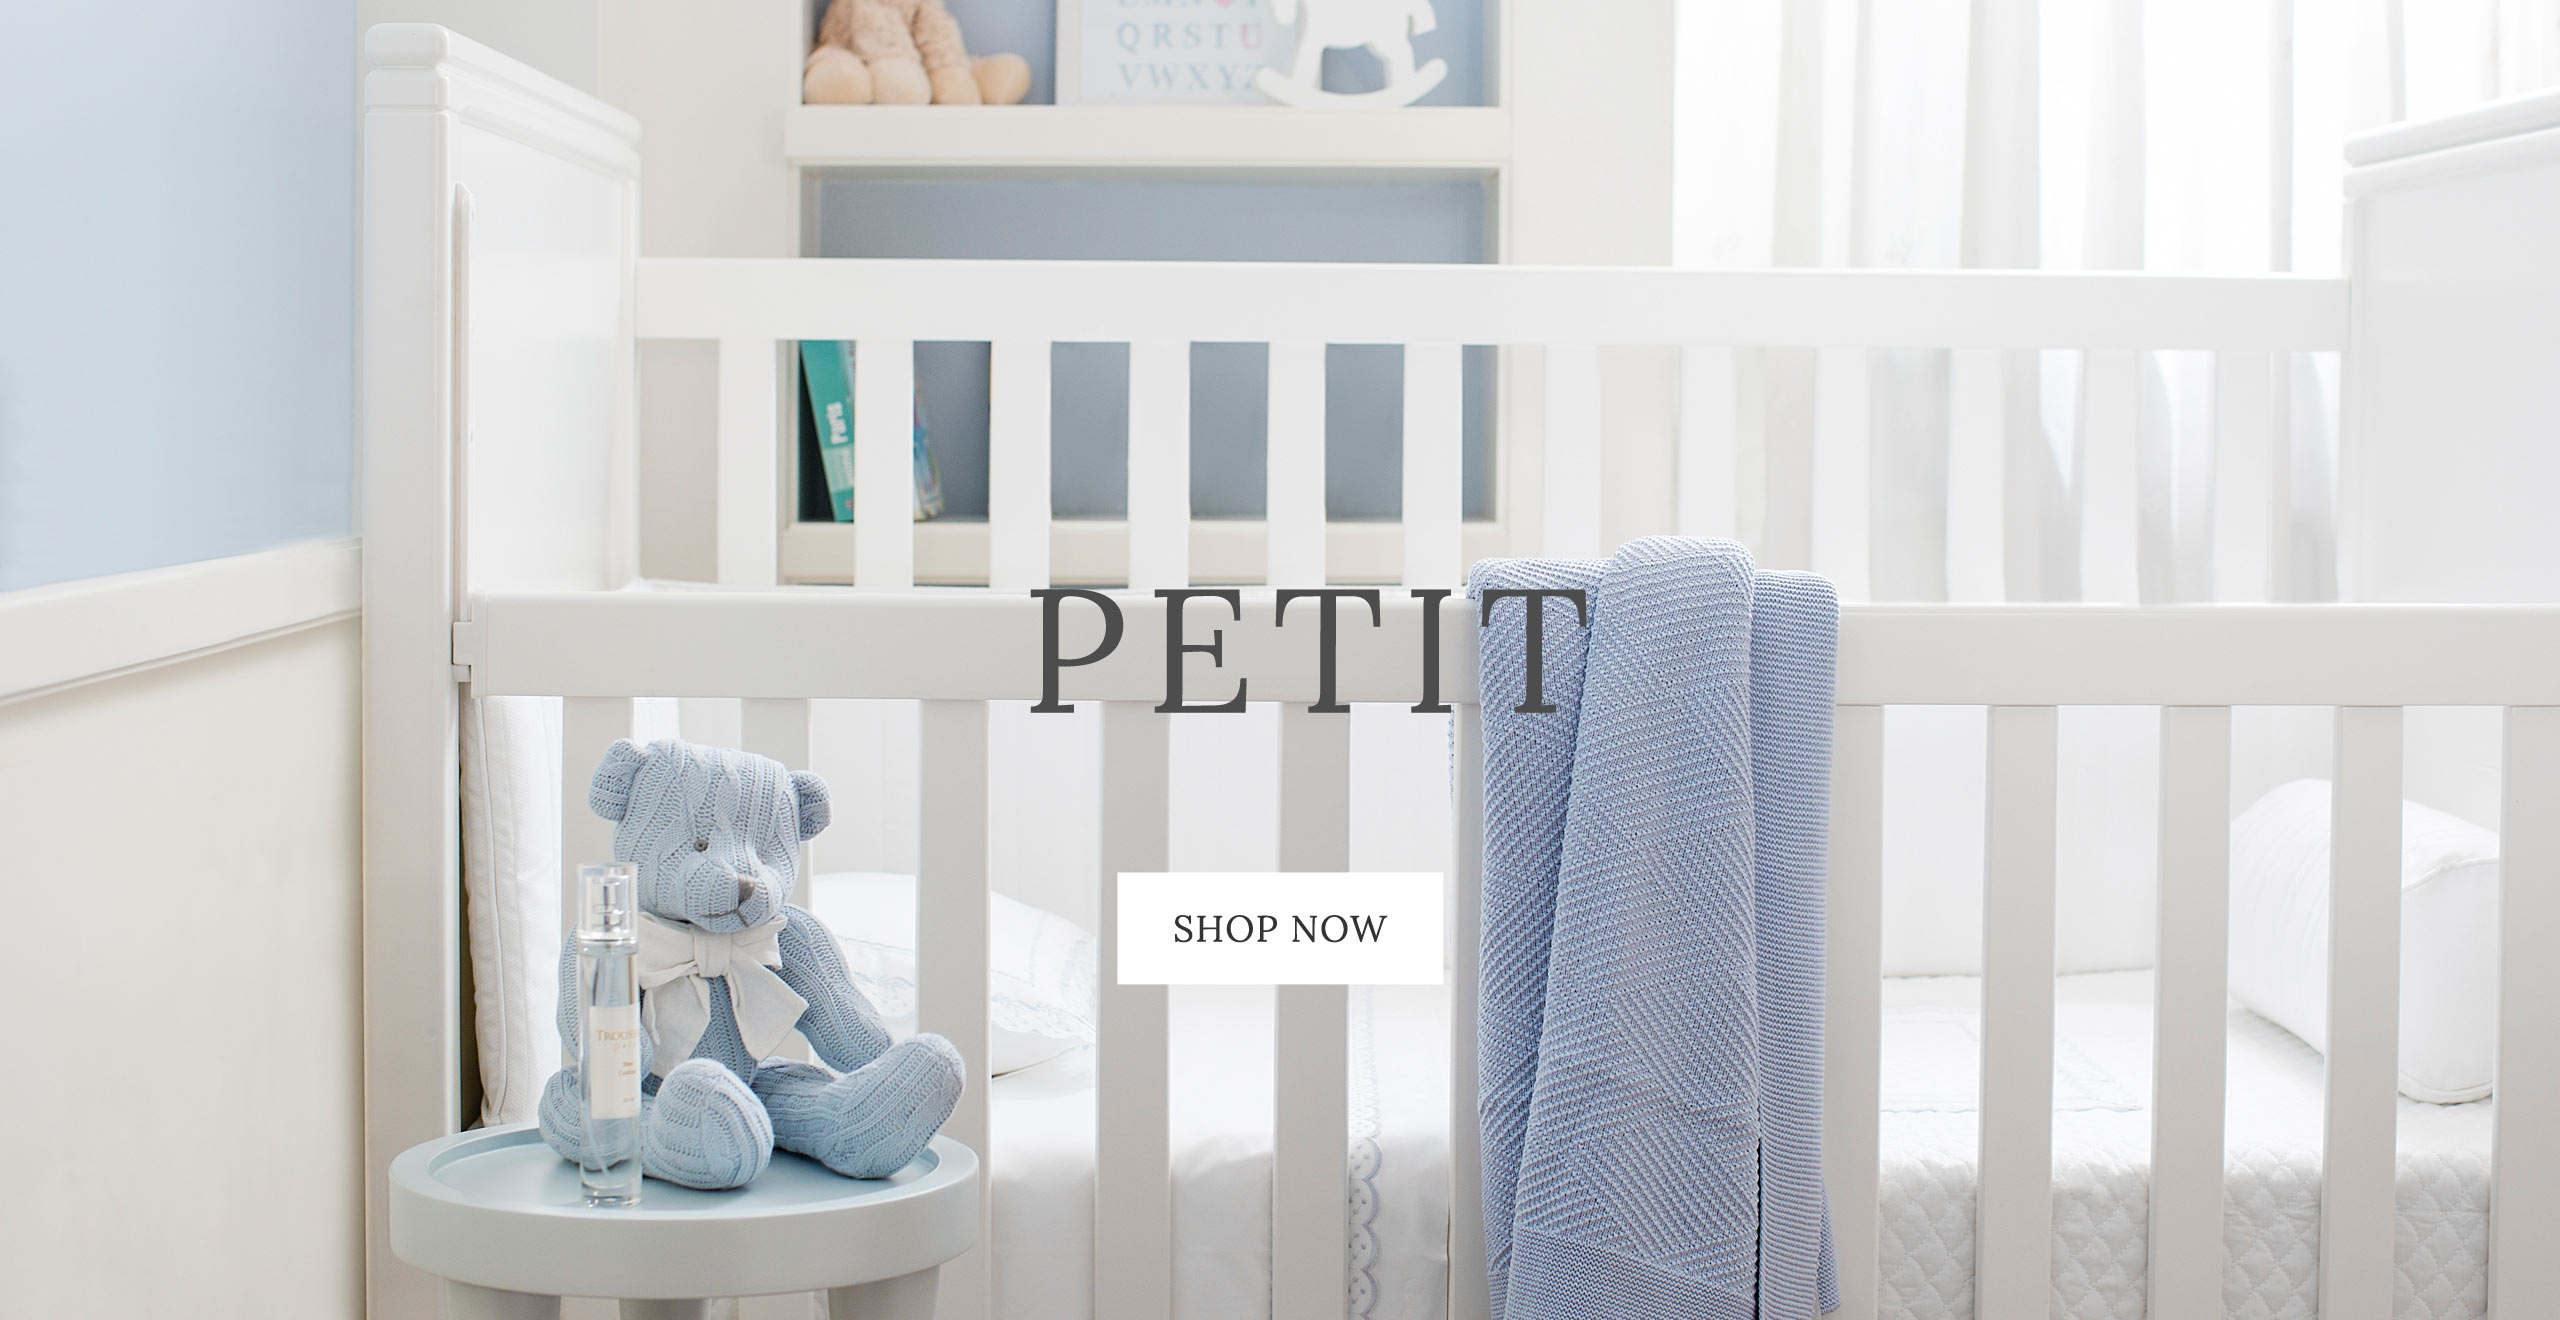 Petit_1502